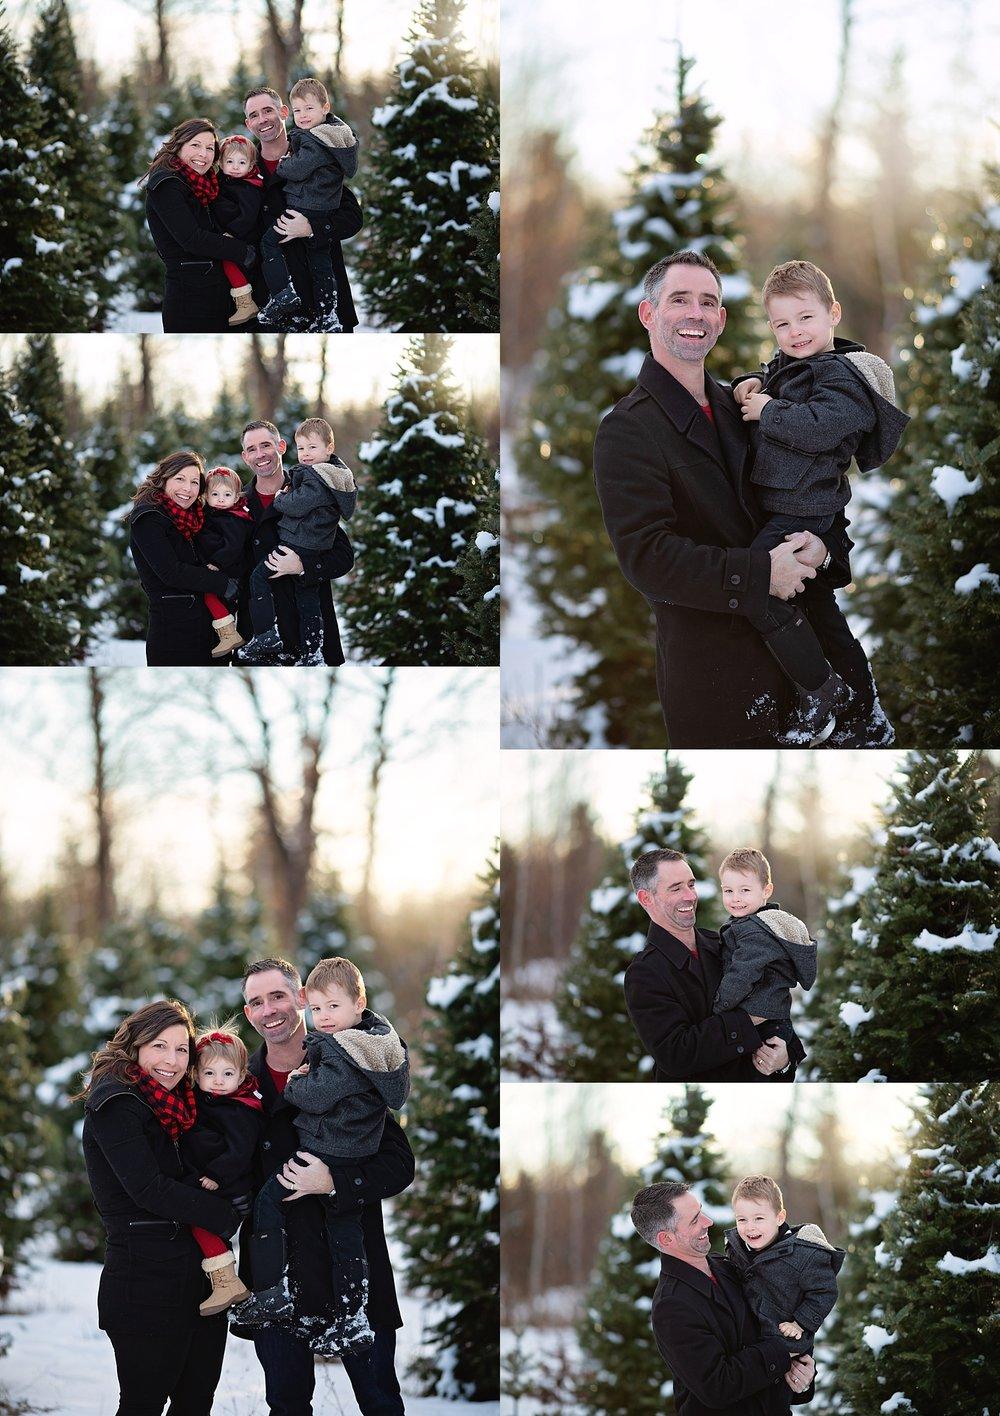 Tree Farm Family Portraits Ottawa